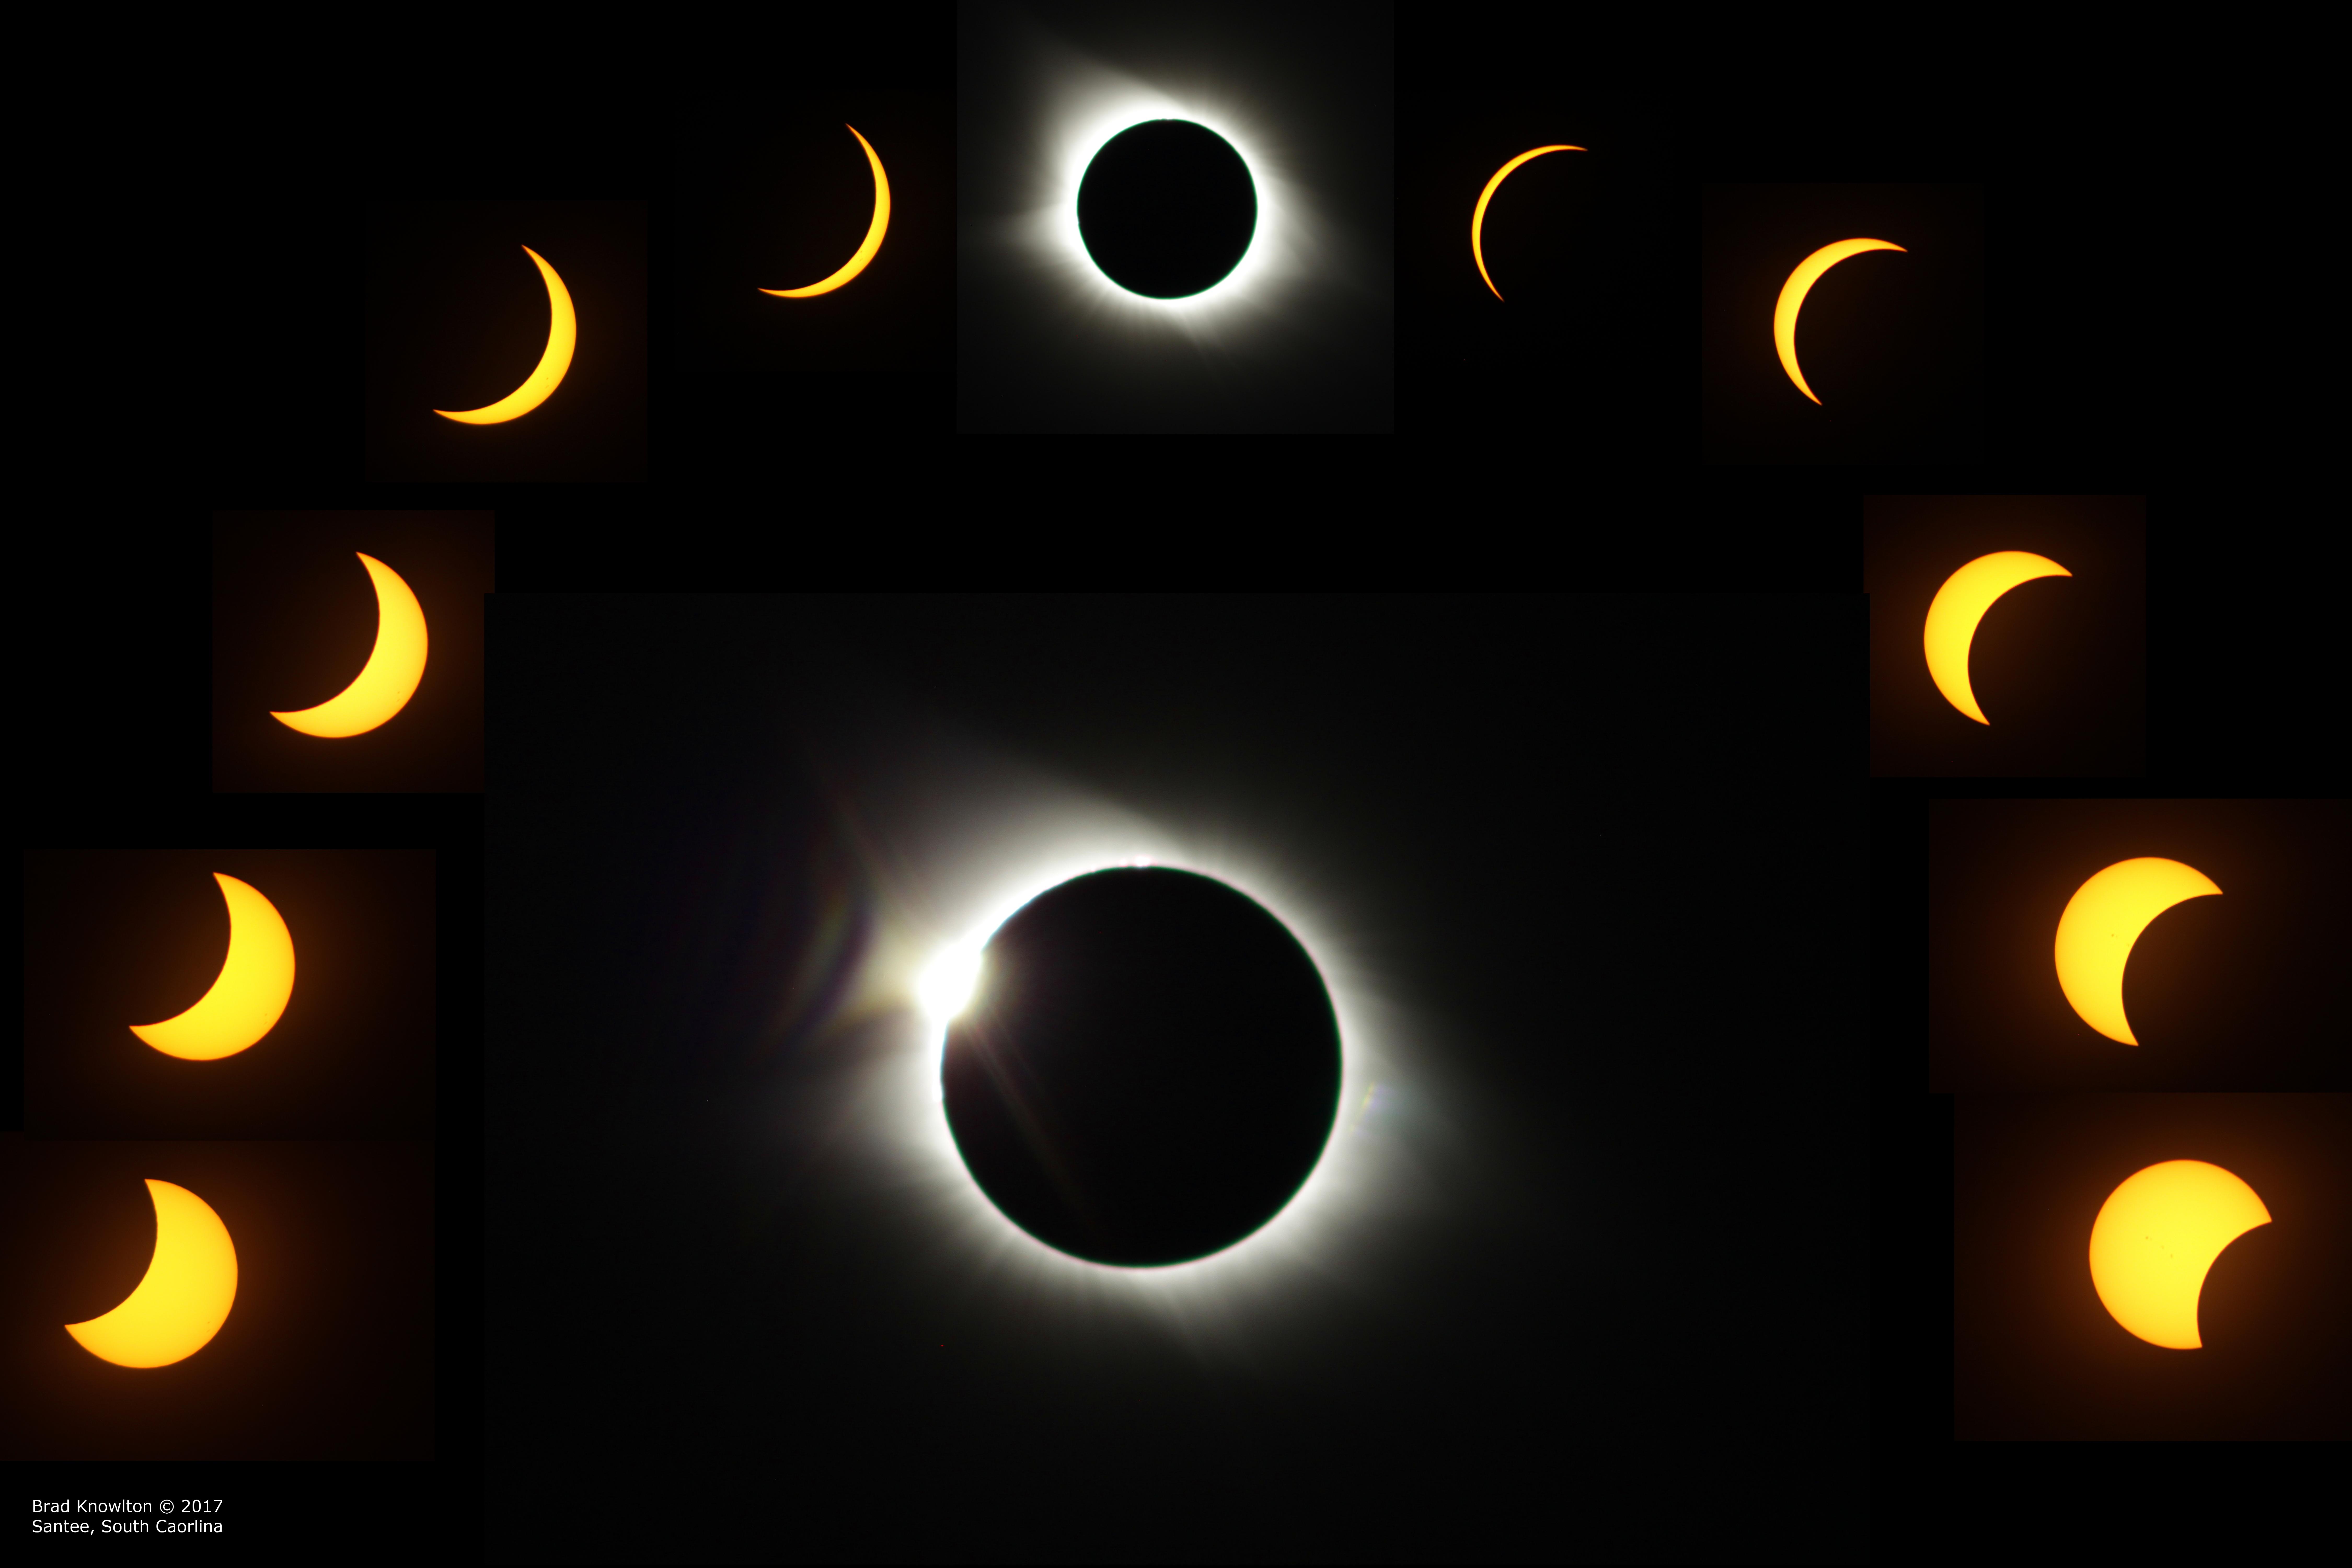 composite-eclise-20x30-ae5c831e7ad1dbb014a4a5bc1e7e83fc15f994e8